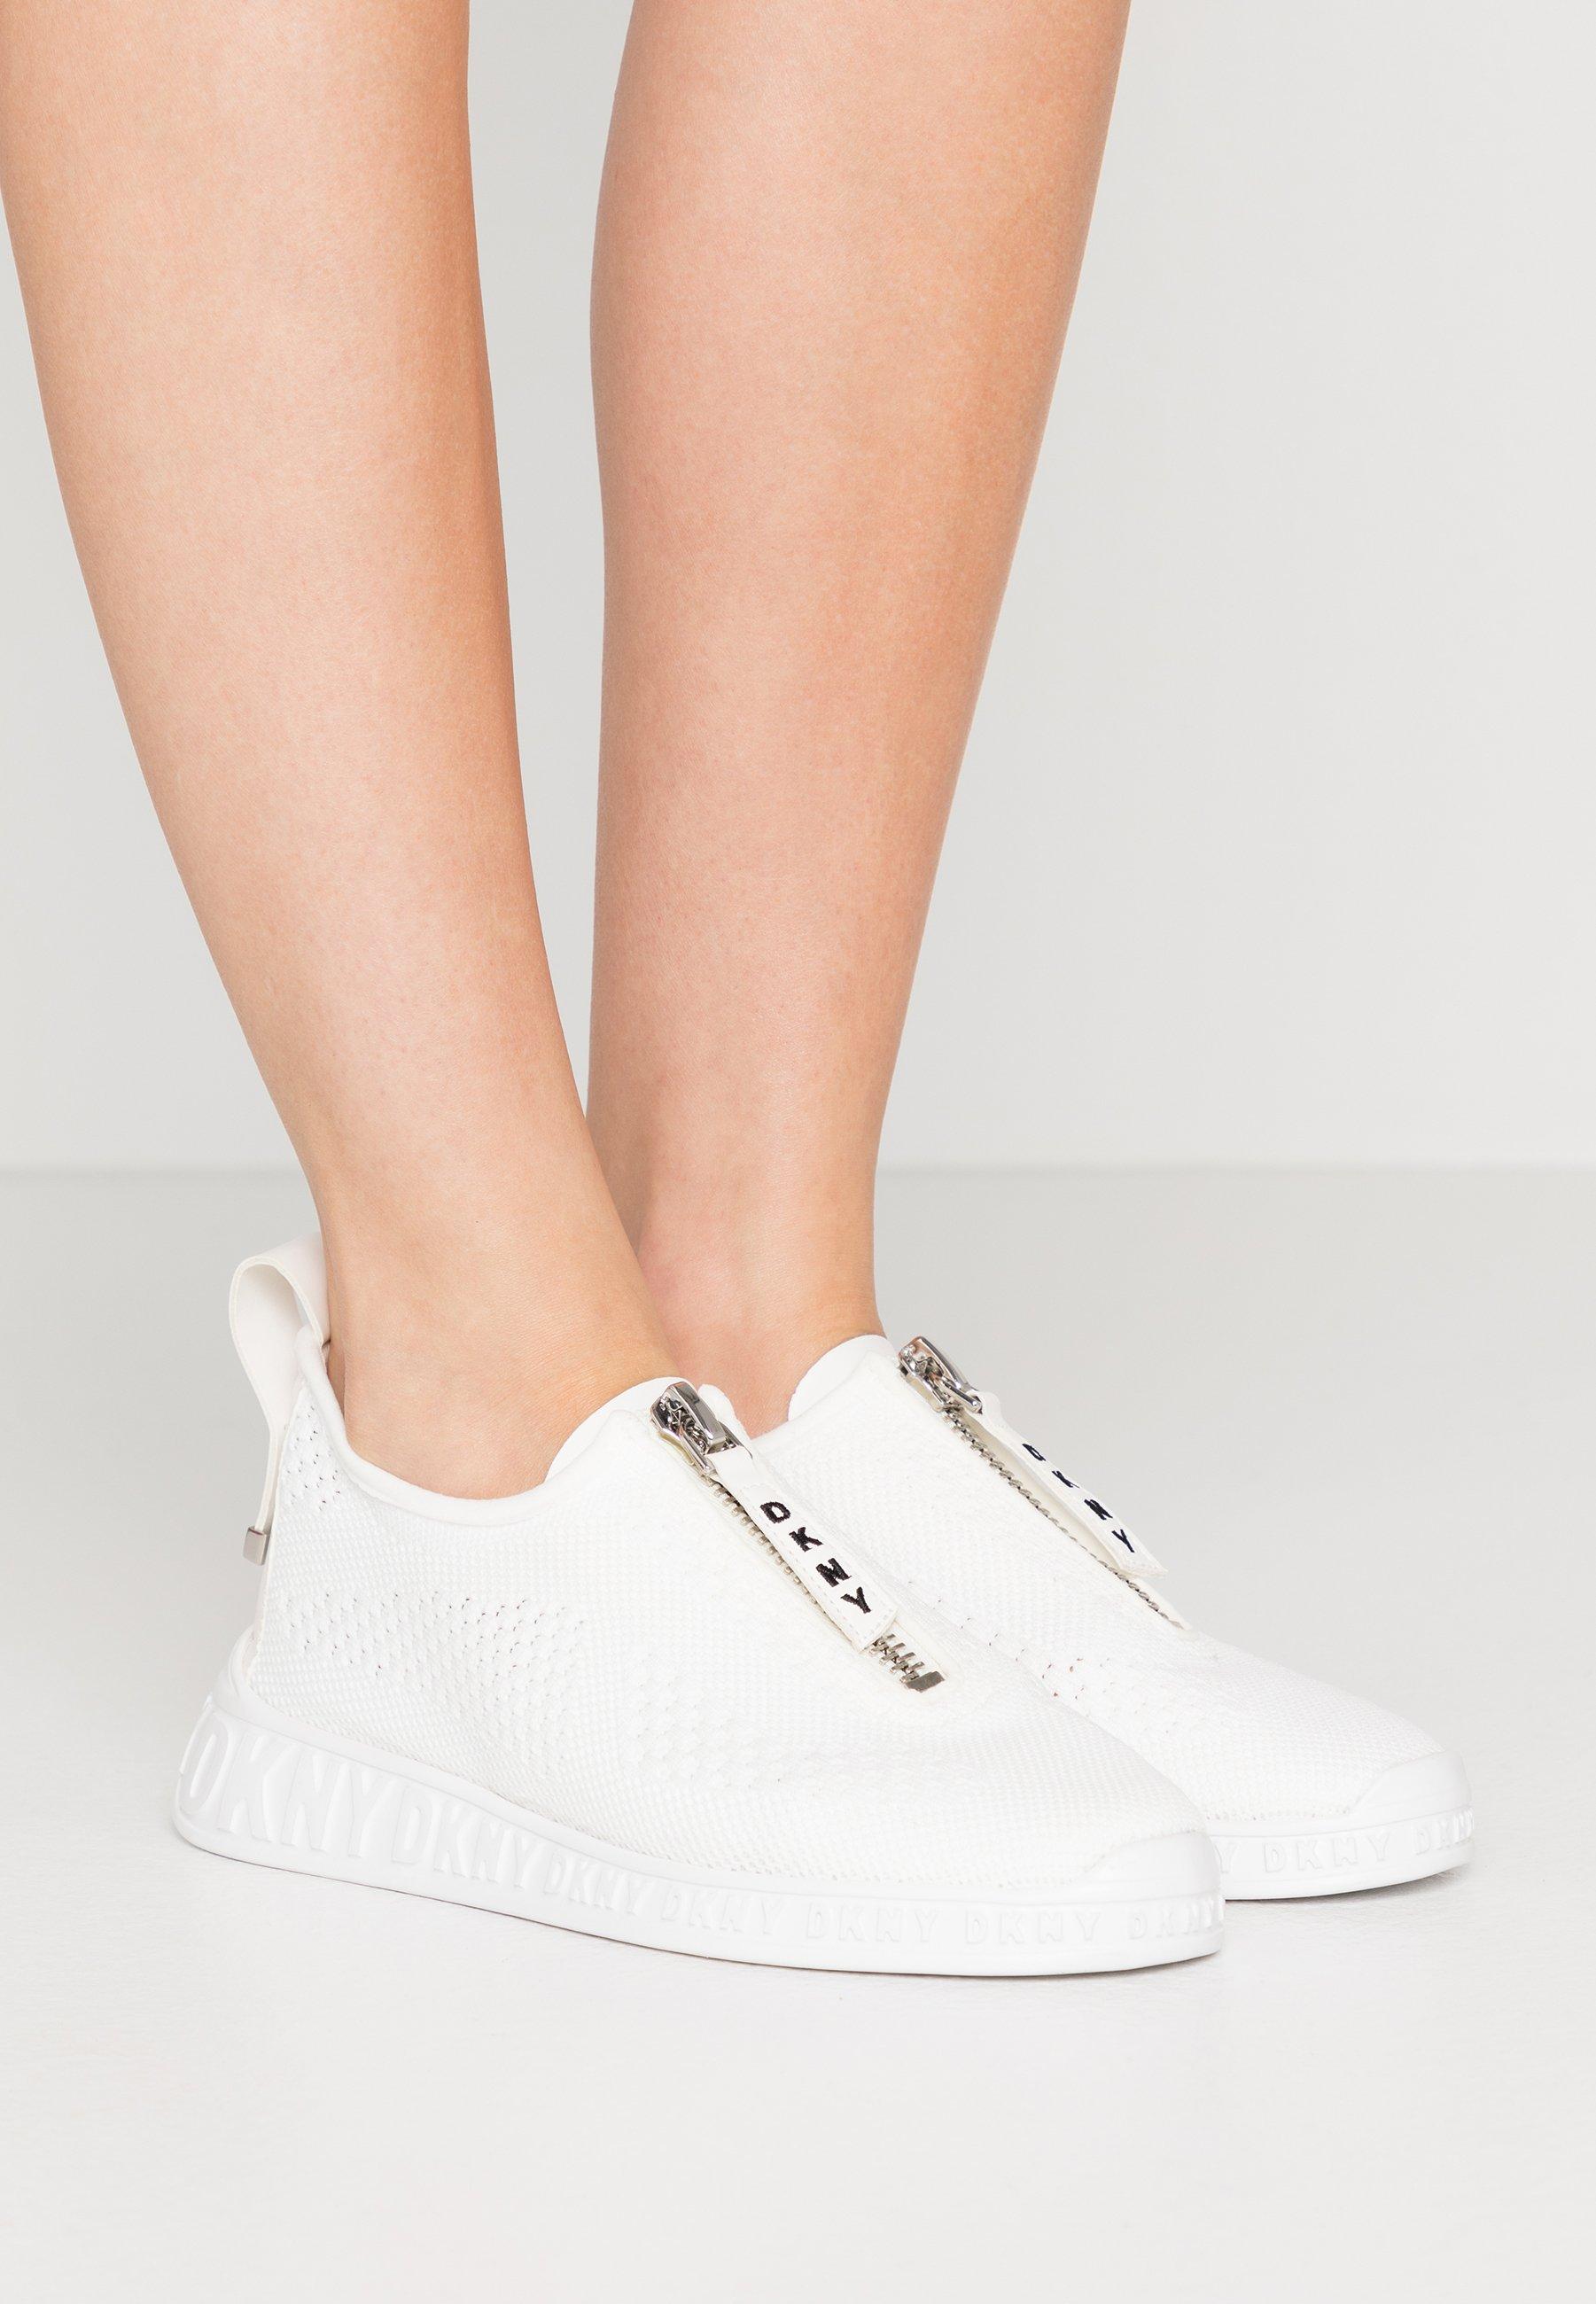 DKNY Skor & kläder Storlek 41 online. Alltid Fri Frakt